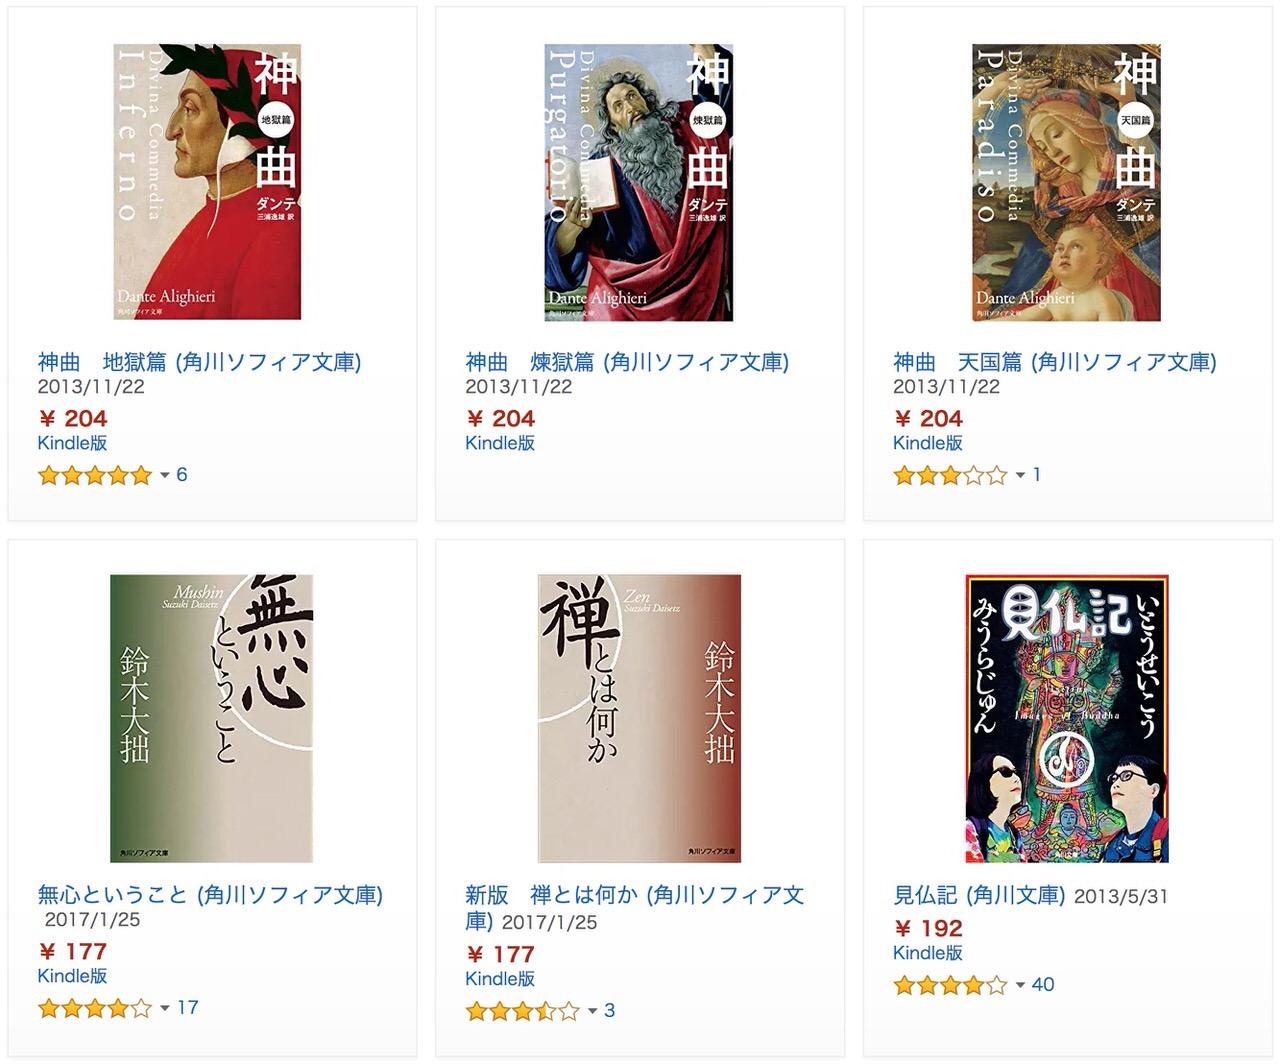 【Kindleセール】75%OFF「KADOKAWA Kindle限定75%OFFセール」開催中 〜ナンシー関、みうらじゅん(9/26まで)